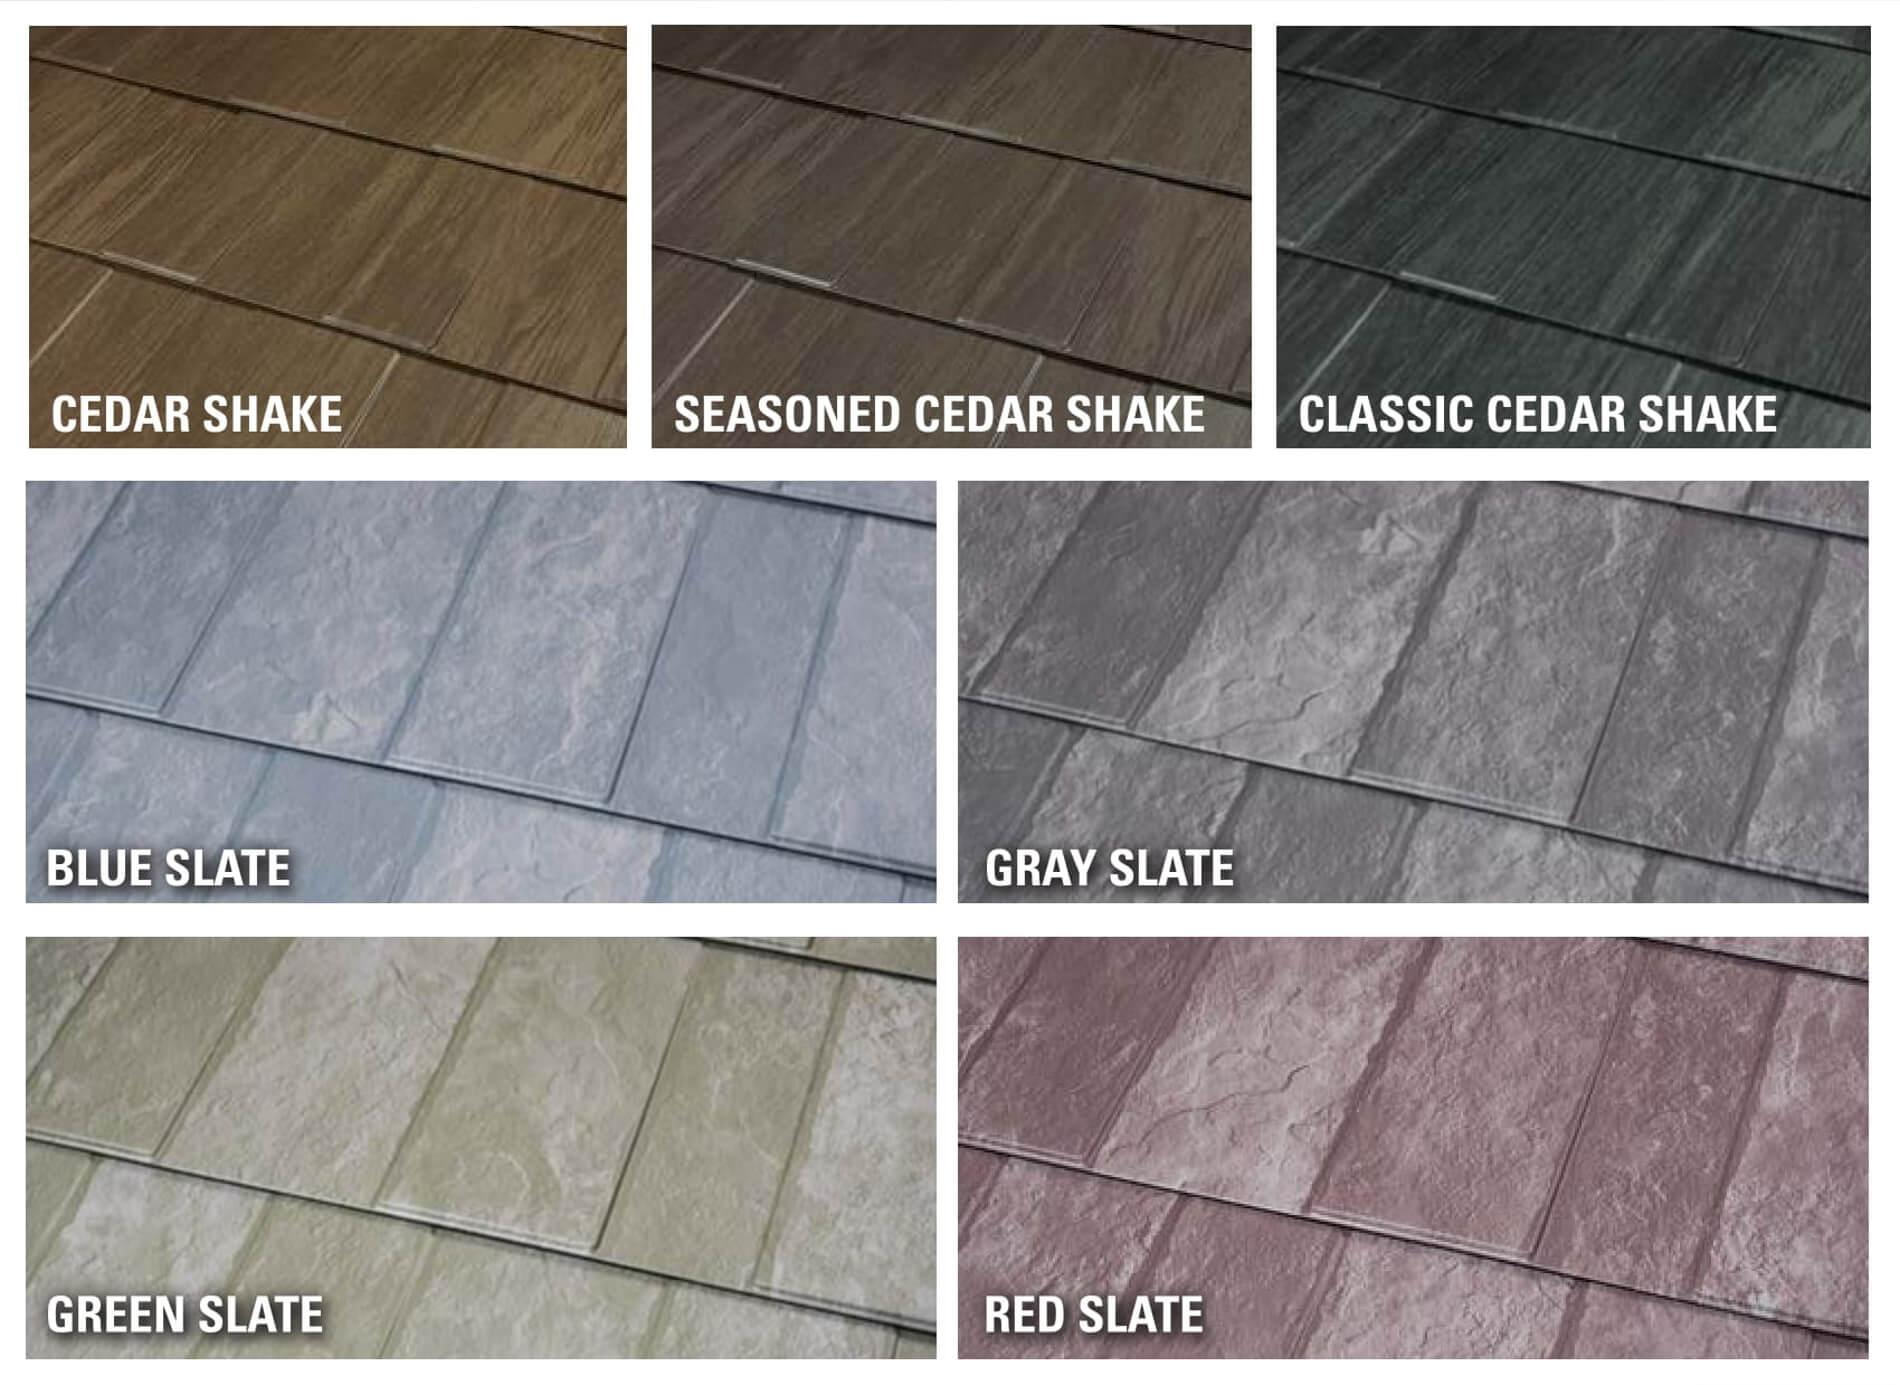 milan-slate-cedar-shake-color-chart-1 (1)